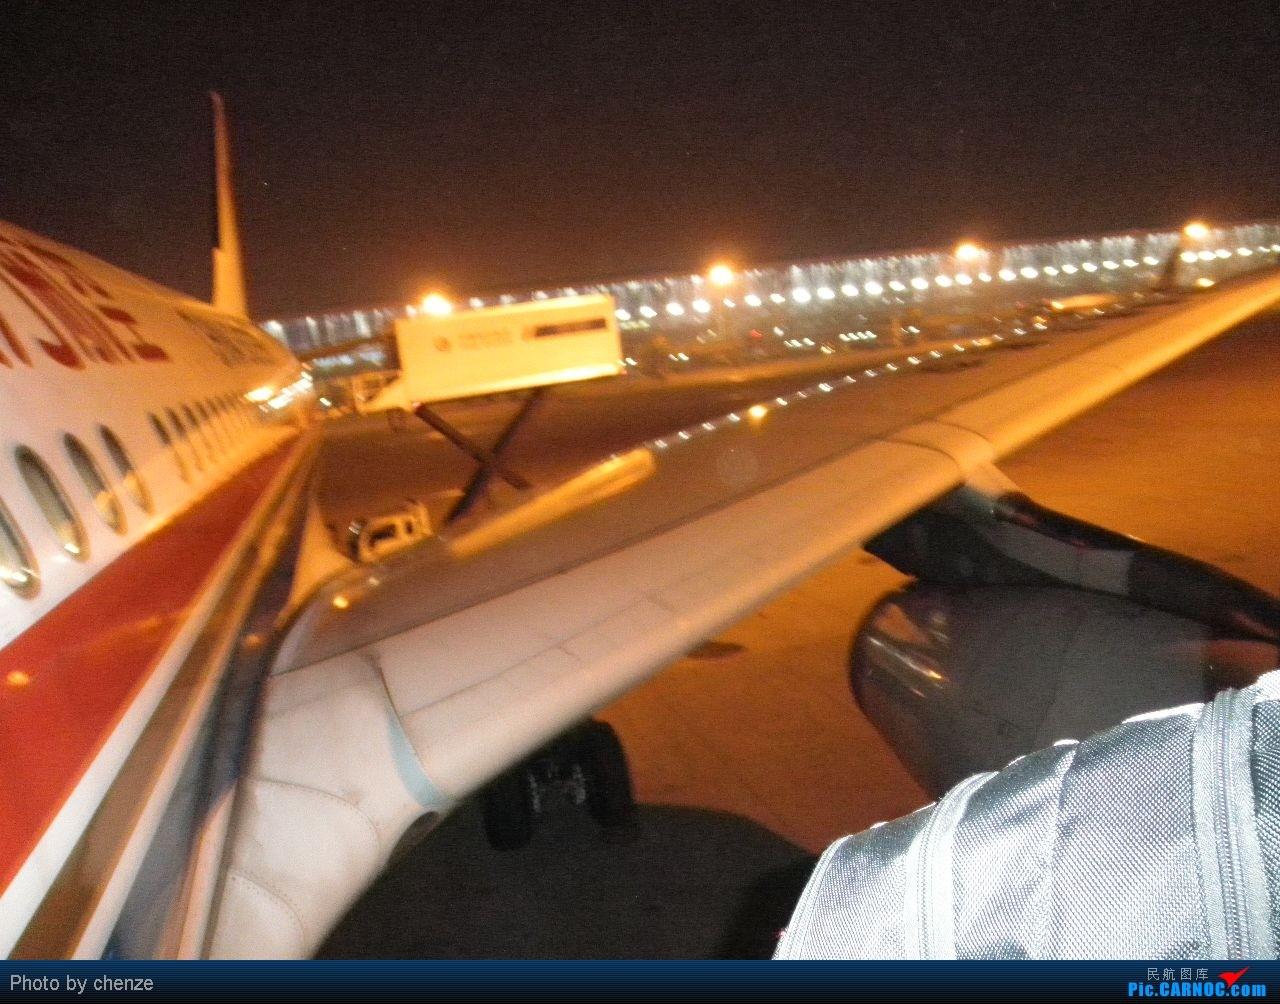 Re:[原创]春节回家探亲,奉上些烂图,笑纳!!PVG-SHE-PVG AIRBUS A330-300 B-6128 中国上海浦东机场